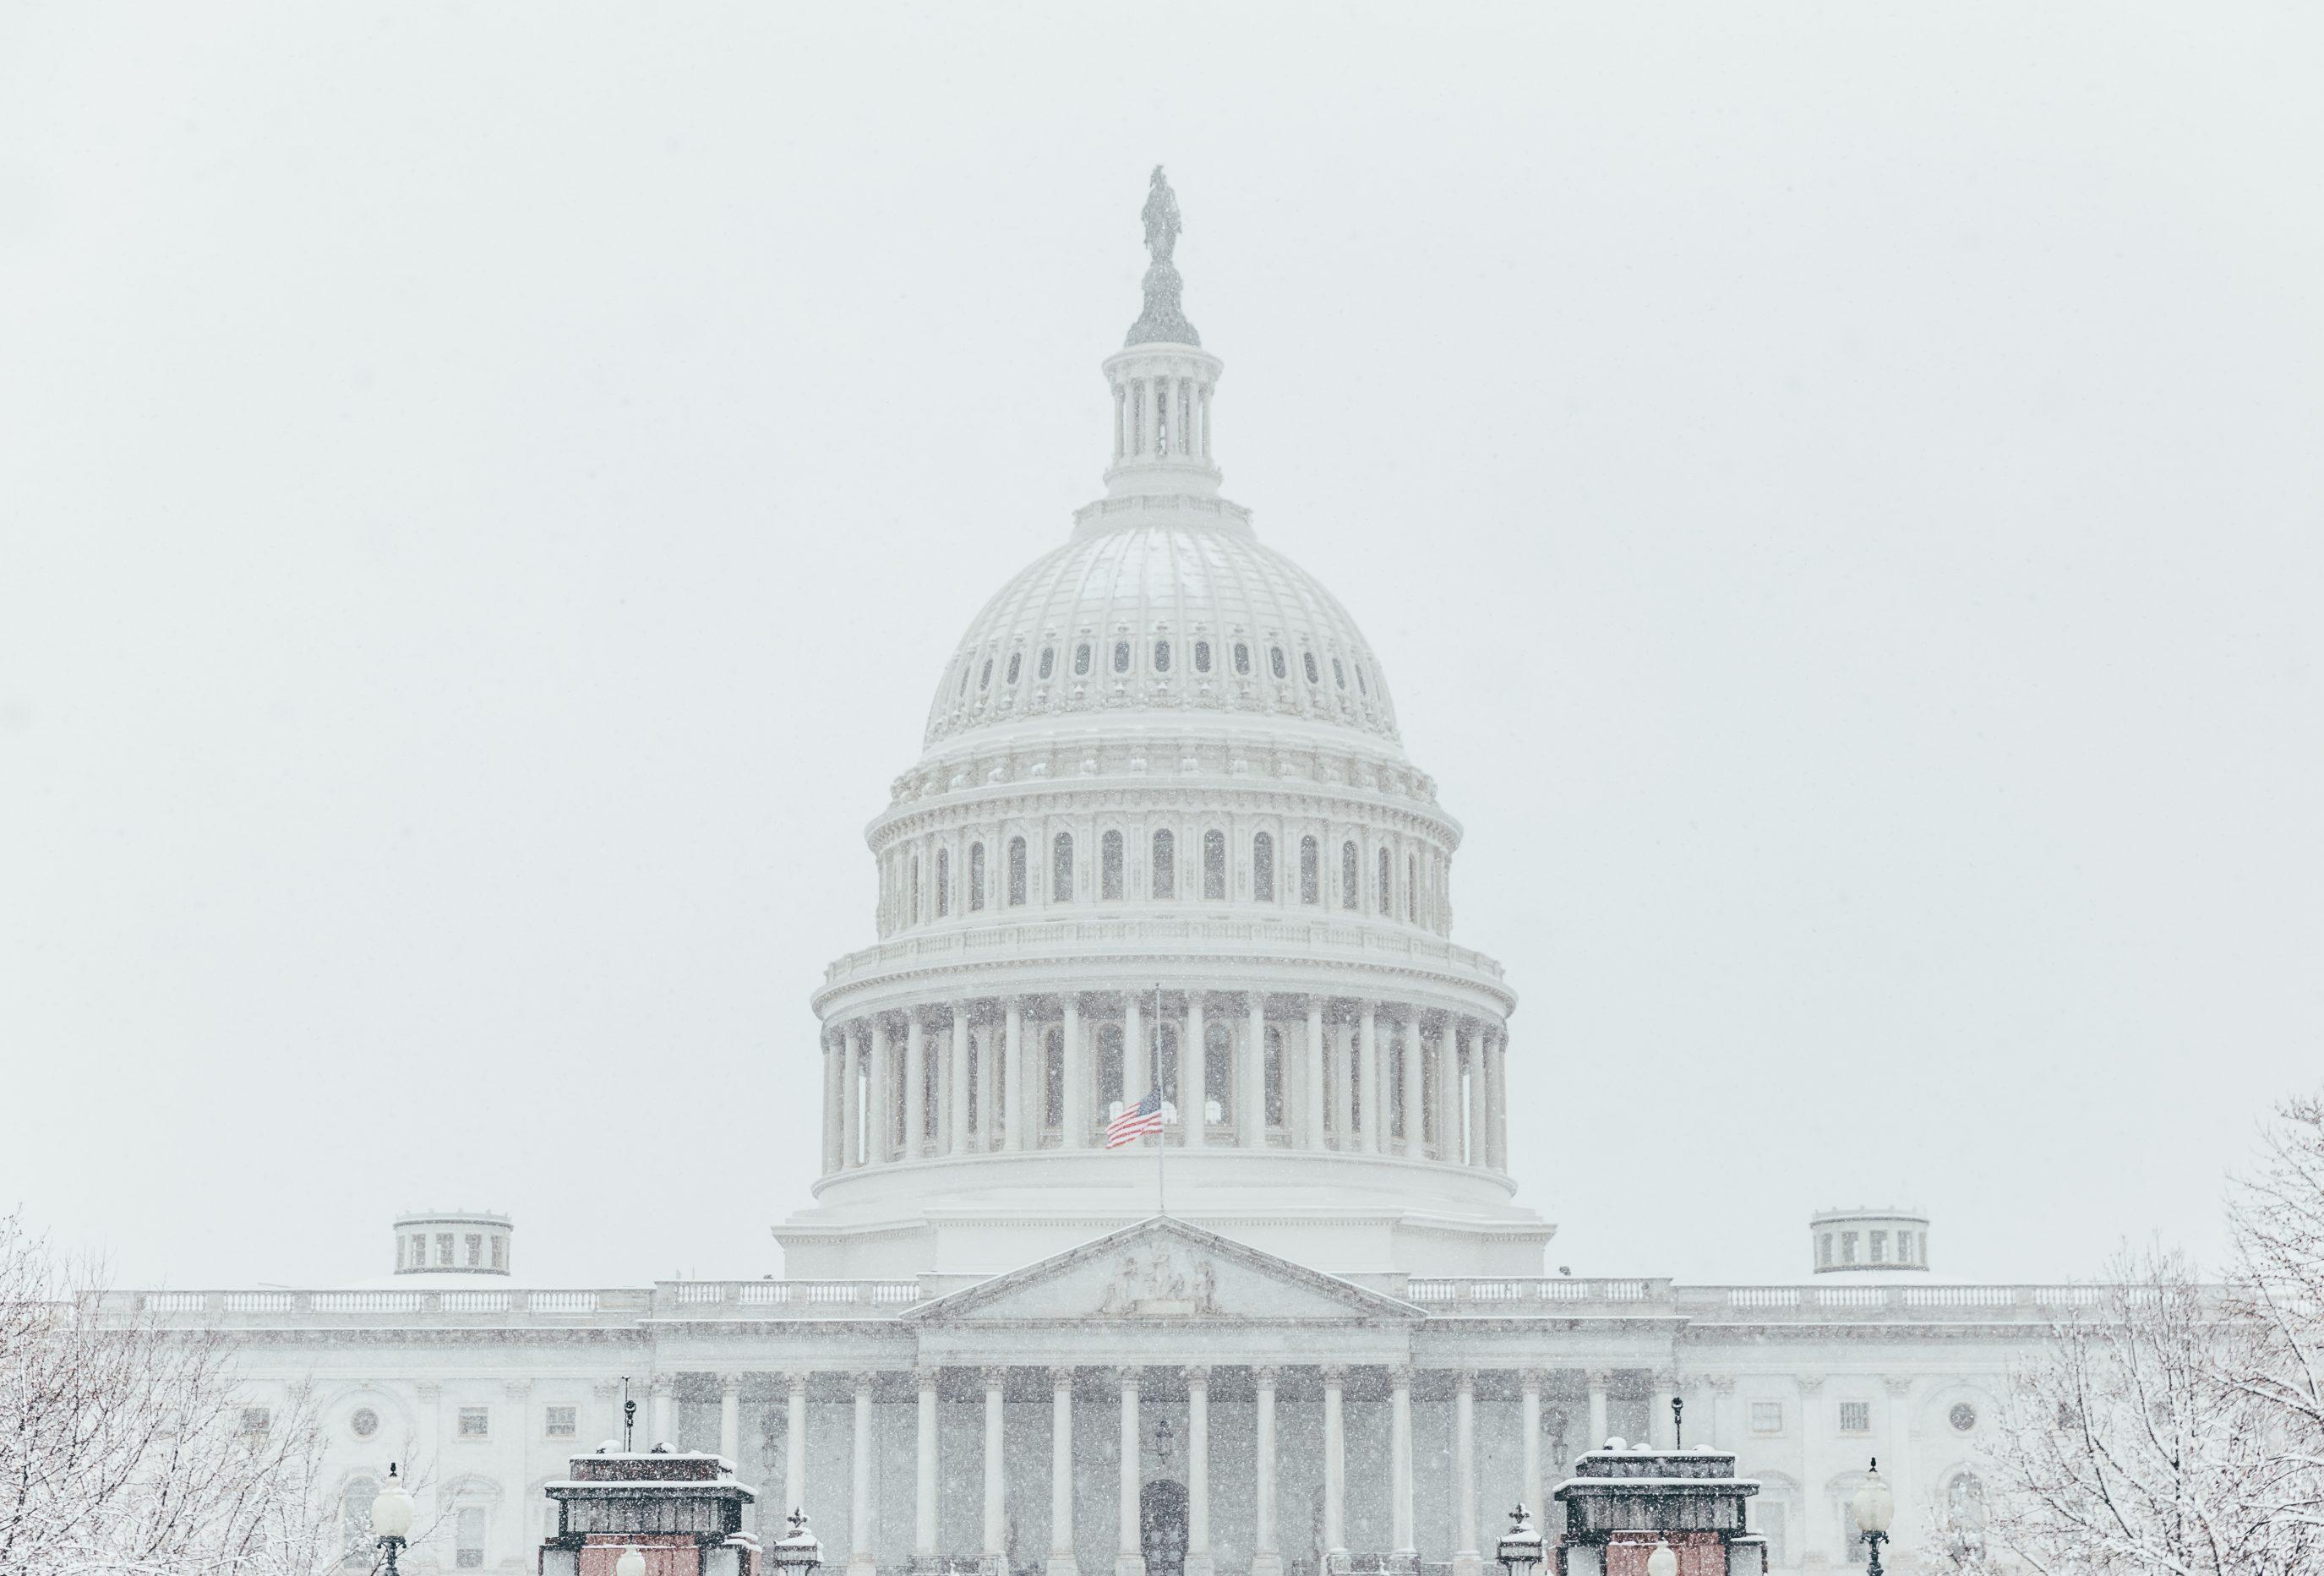 Us Capitol Snow Storm